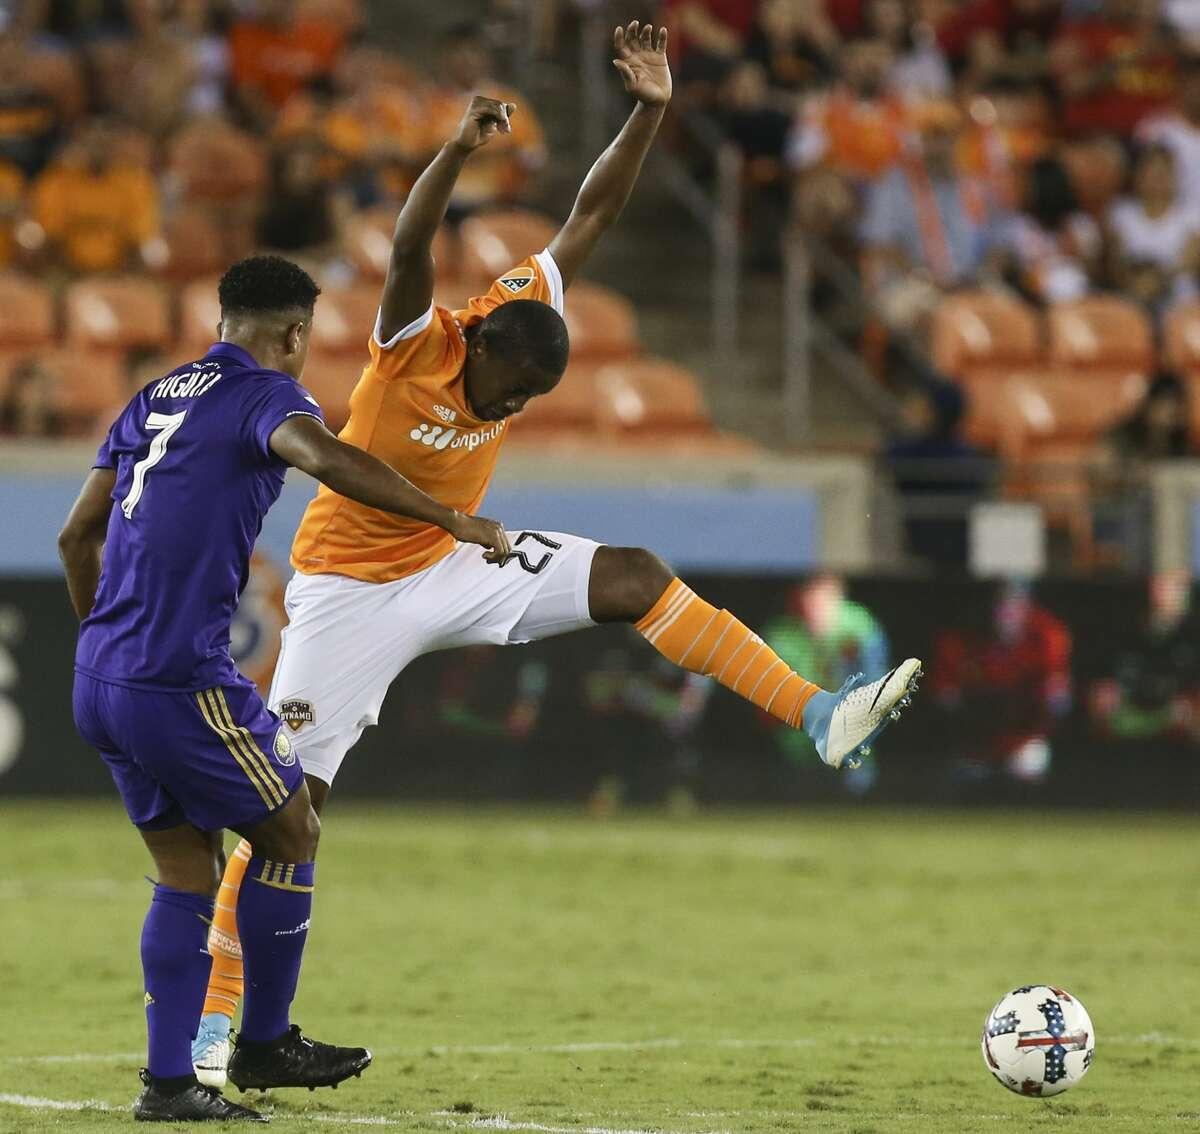 Houston Dynamo midfielder Boniek Garcia (27) jumps as Orlando City SC midfielder Cristian Higuita (7) makes a pass during the second half of the game at BBVA Compass Stadium Saturday, May 6, 2017, in Houston. ( Yi-Chin Lee / Houston Chronicle )